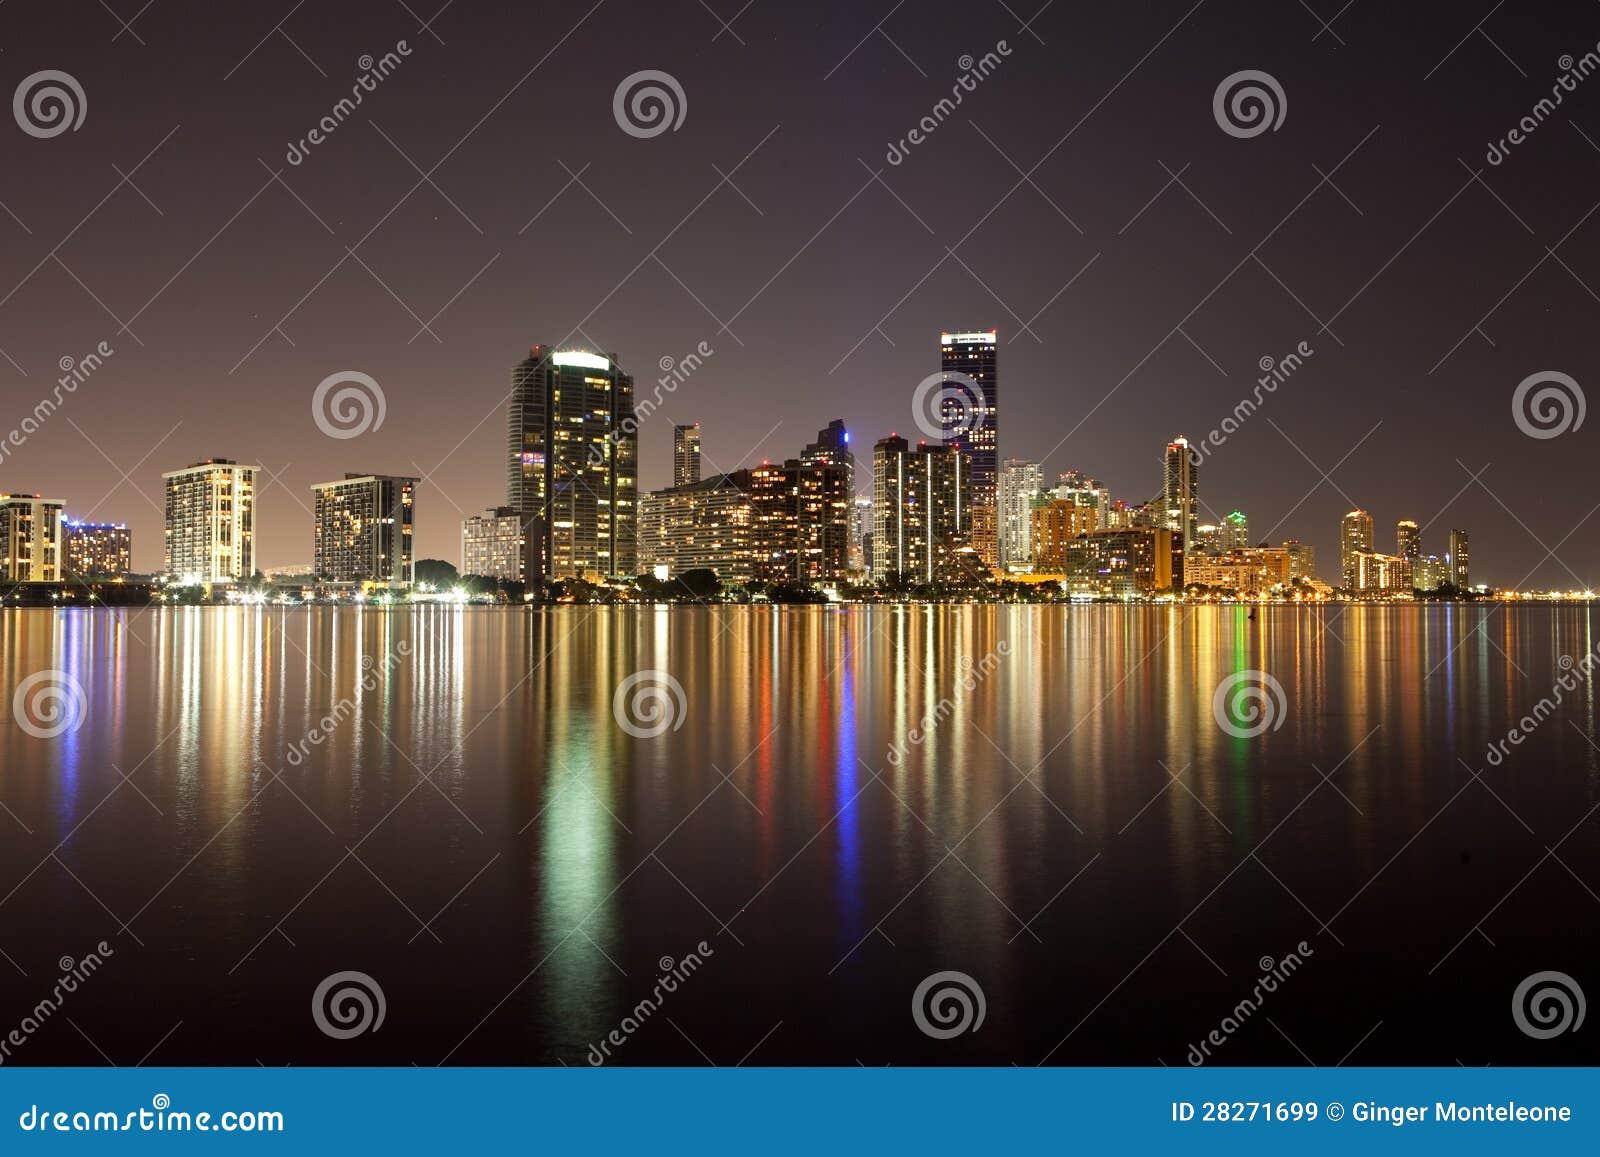 night miami skyline stock image  image of shore  ocean